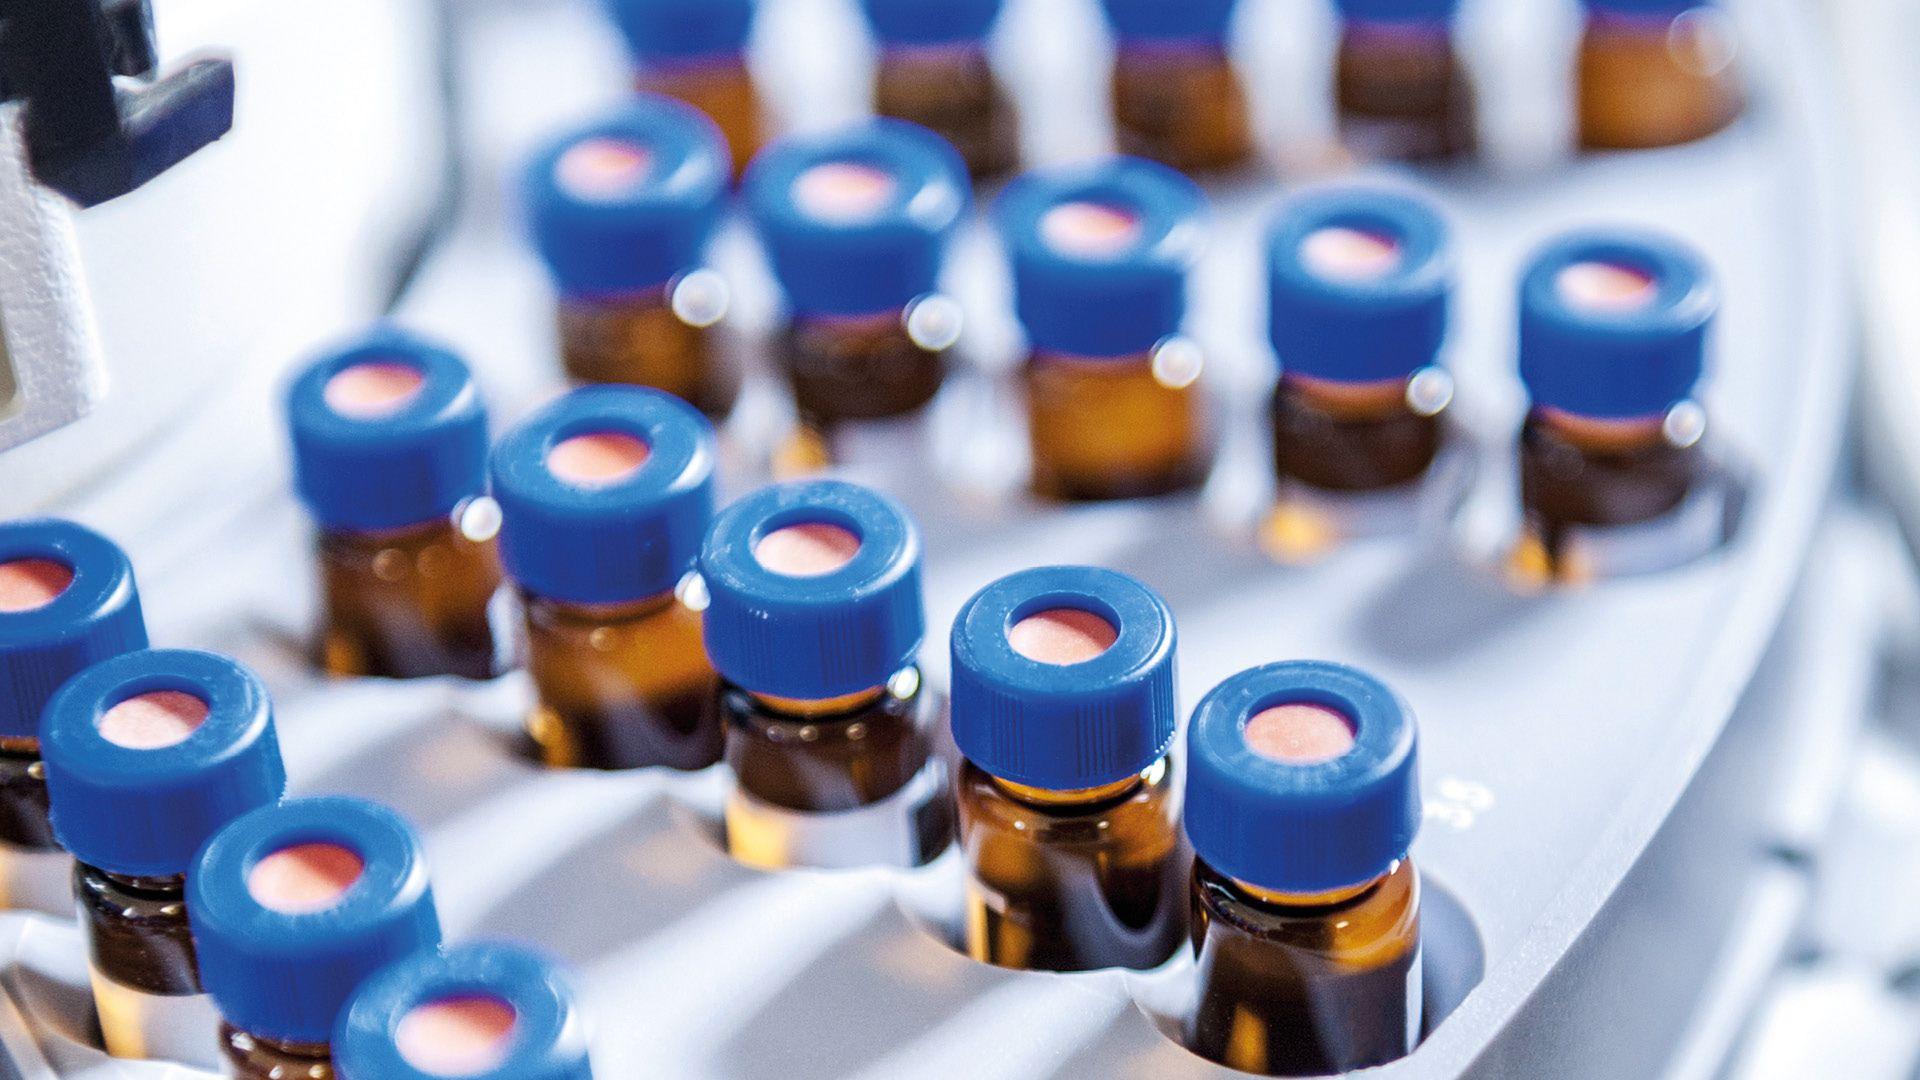 Sanquin image vials